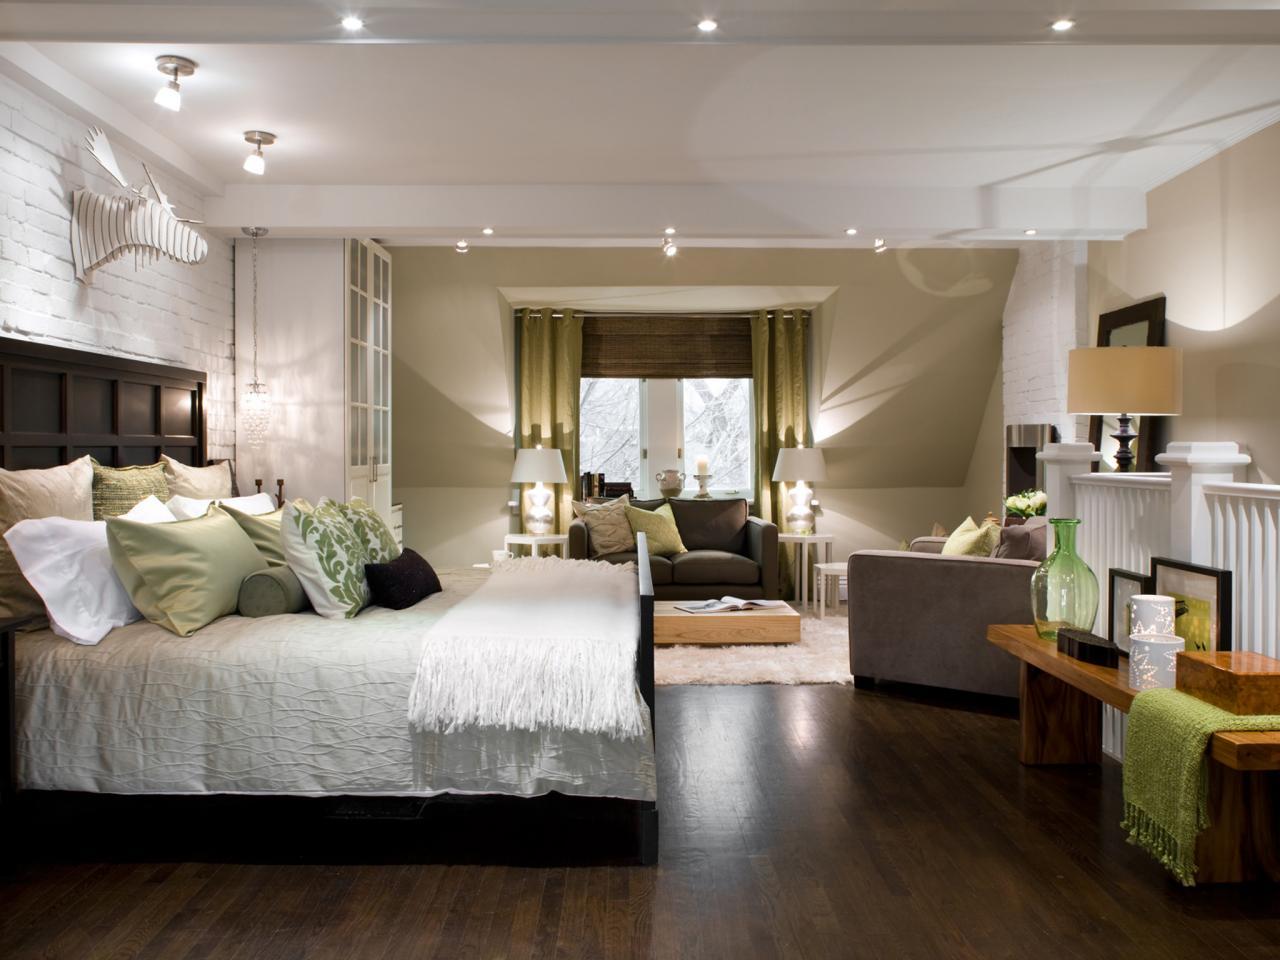 Install Modern Style Lighting Fixtures